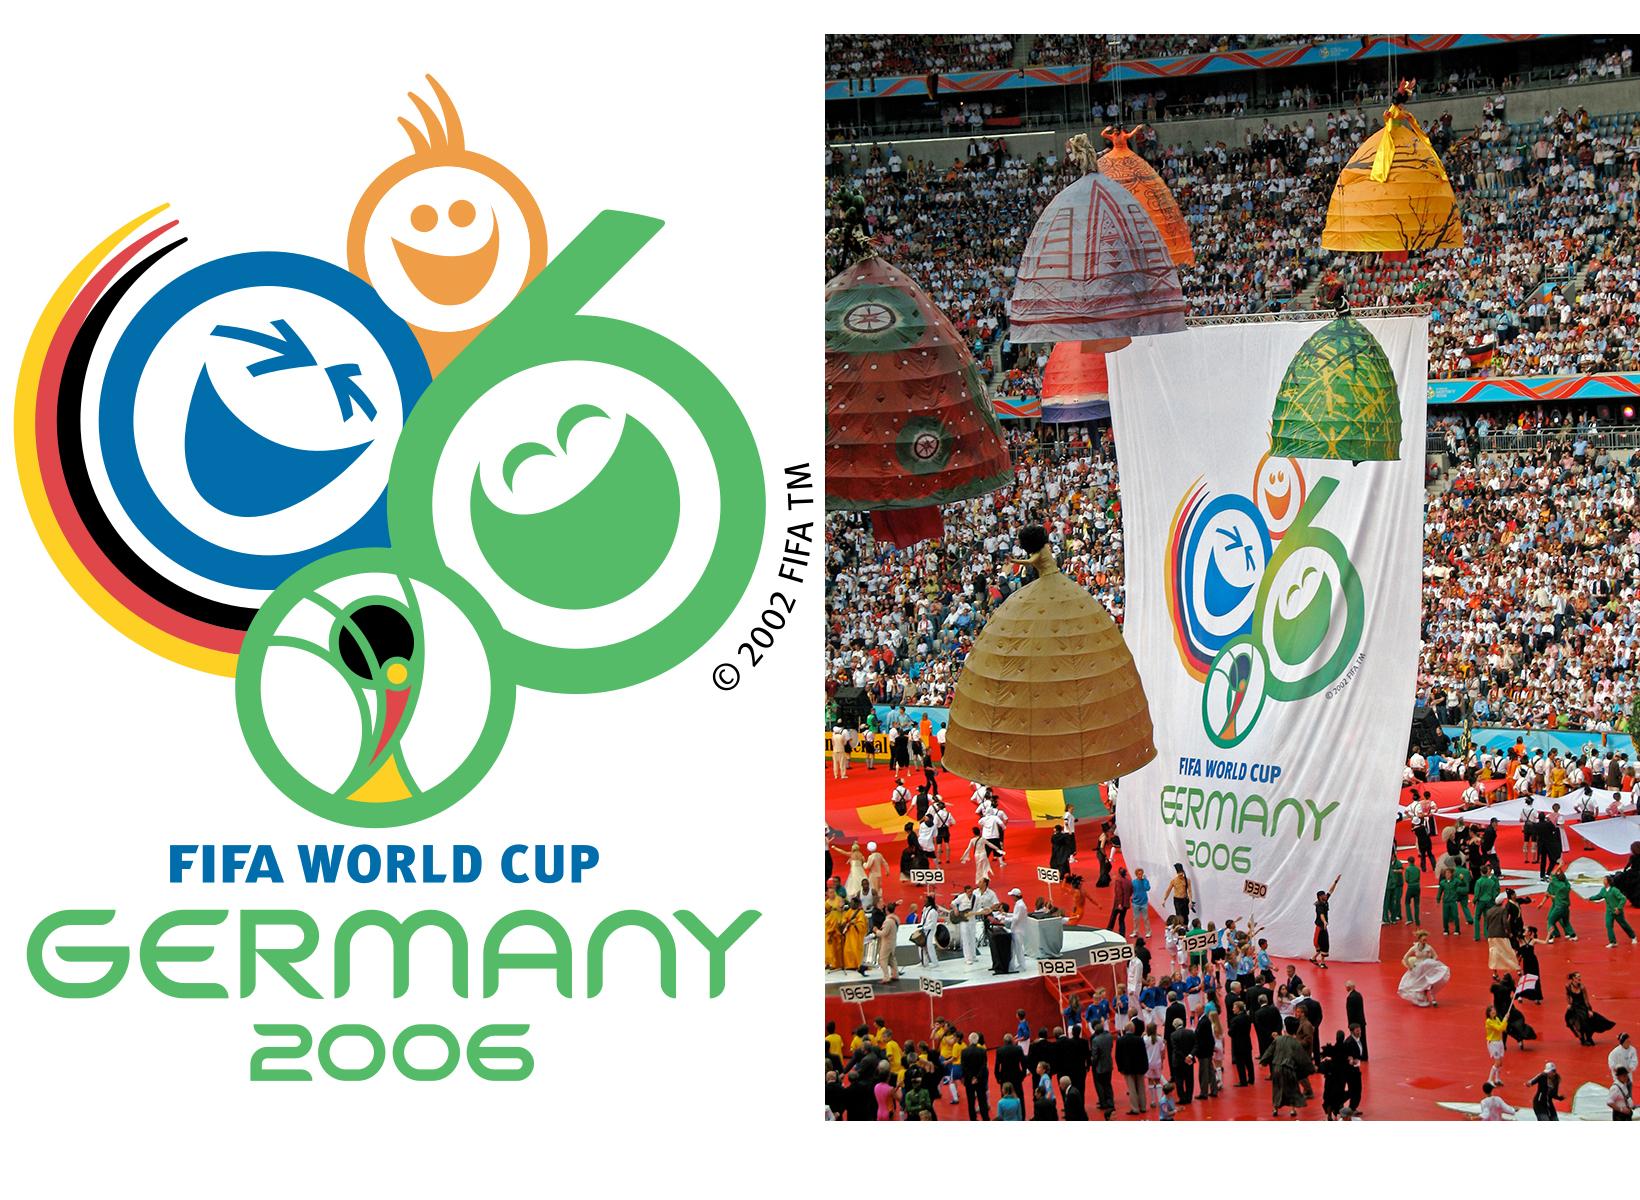 rgb_creative_ideas_design_logo_fifa_worldcup_history_02